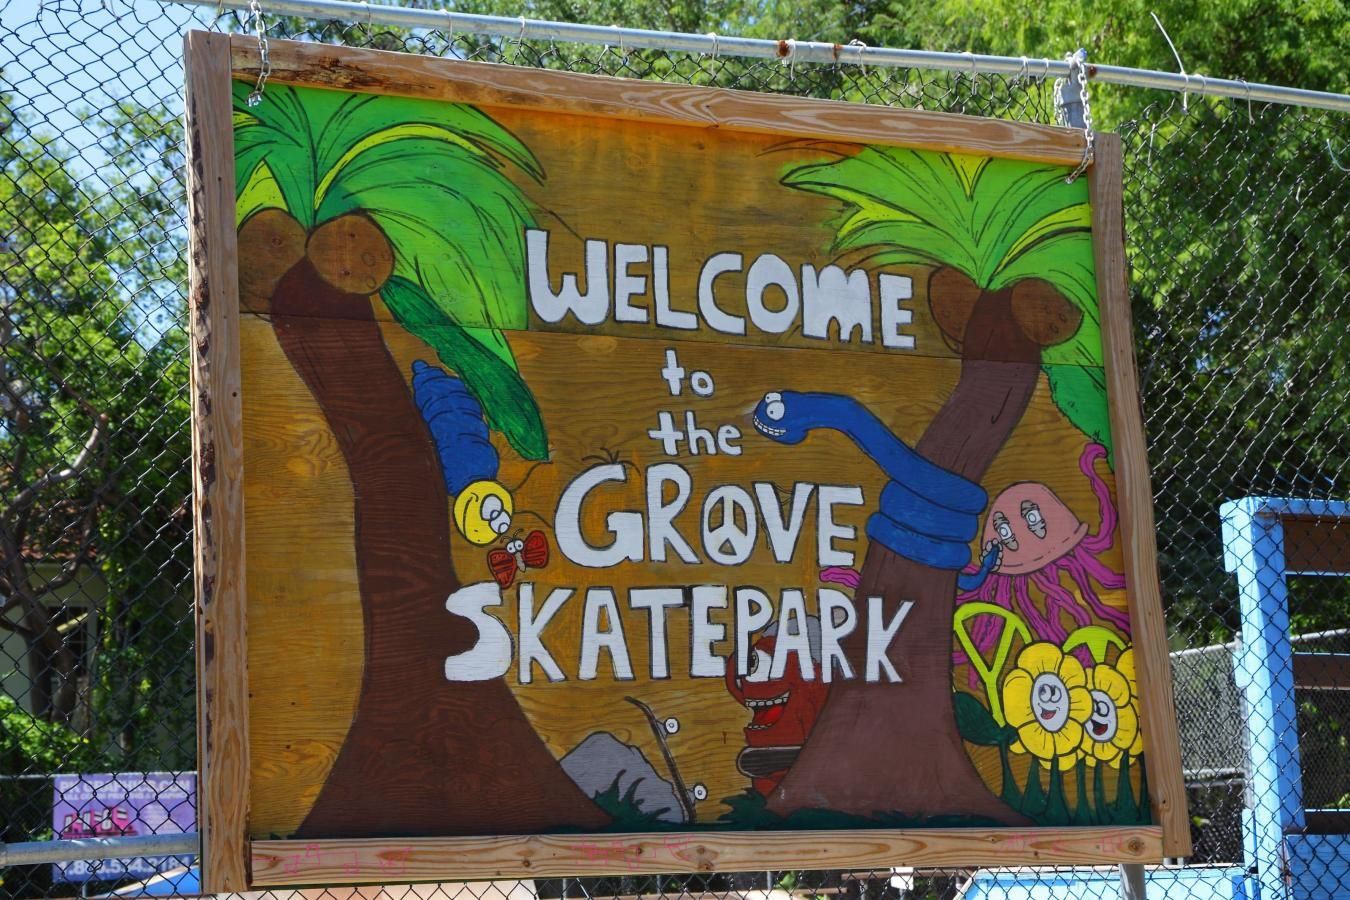 Peacock Park Grove skatepark